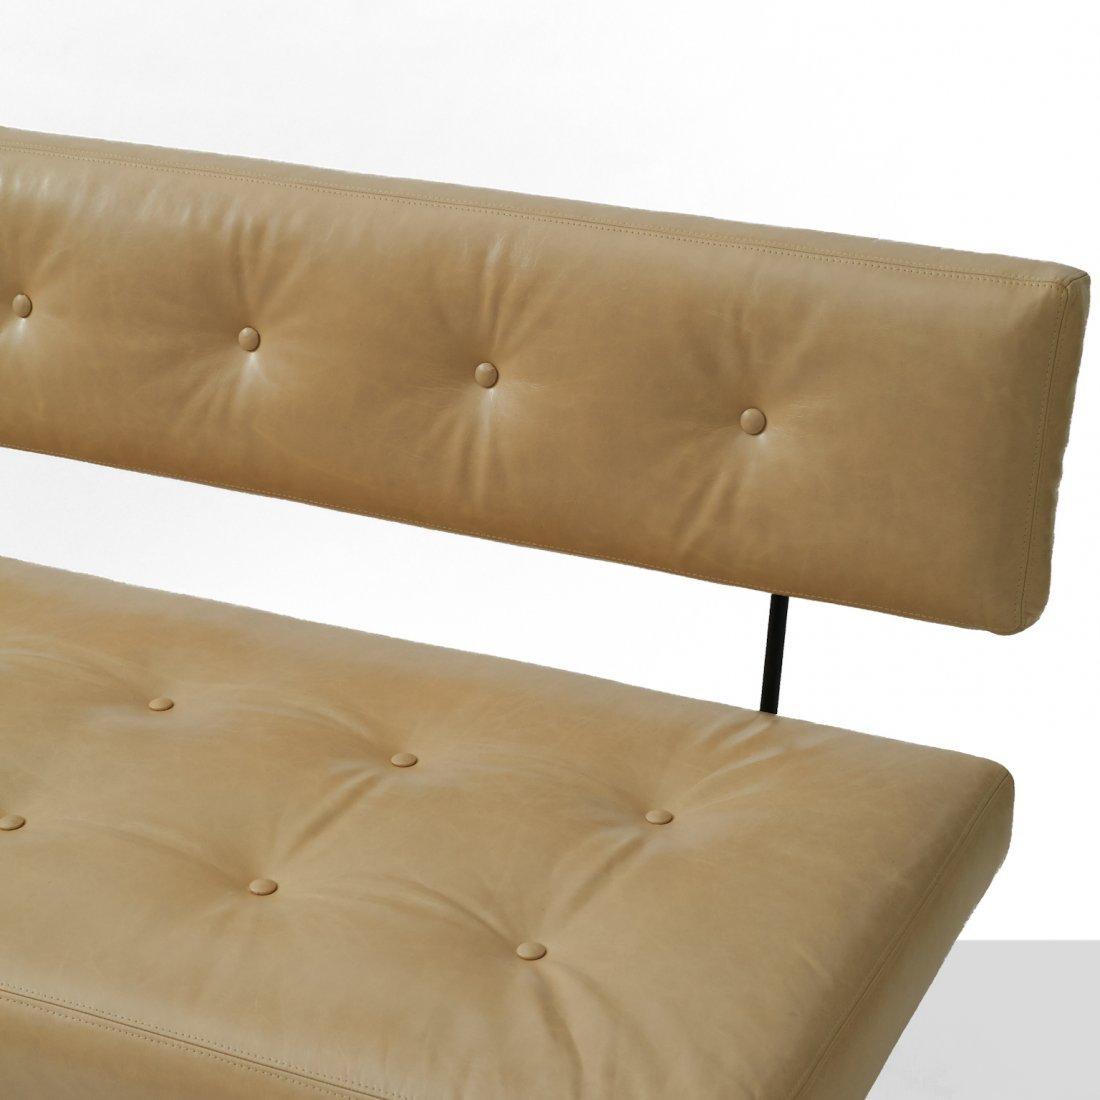 Rare Norman Cherner Sofa - 5